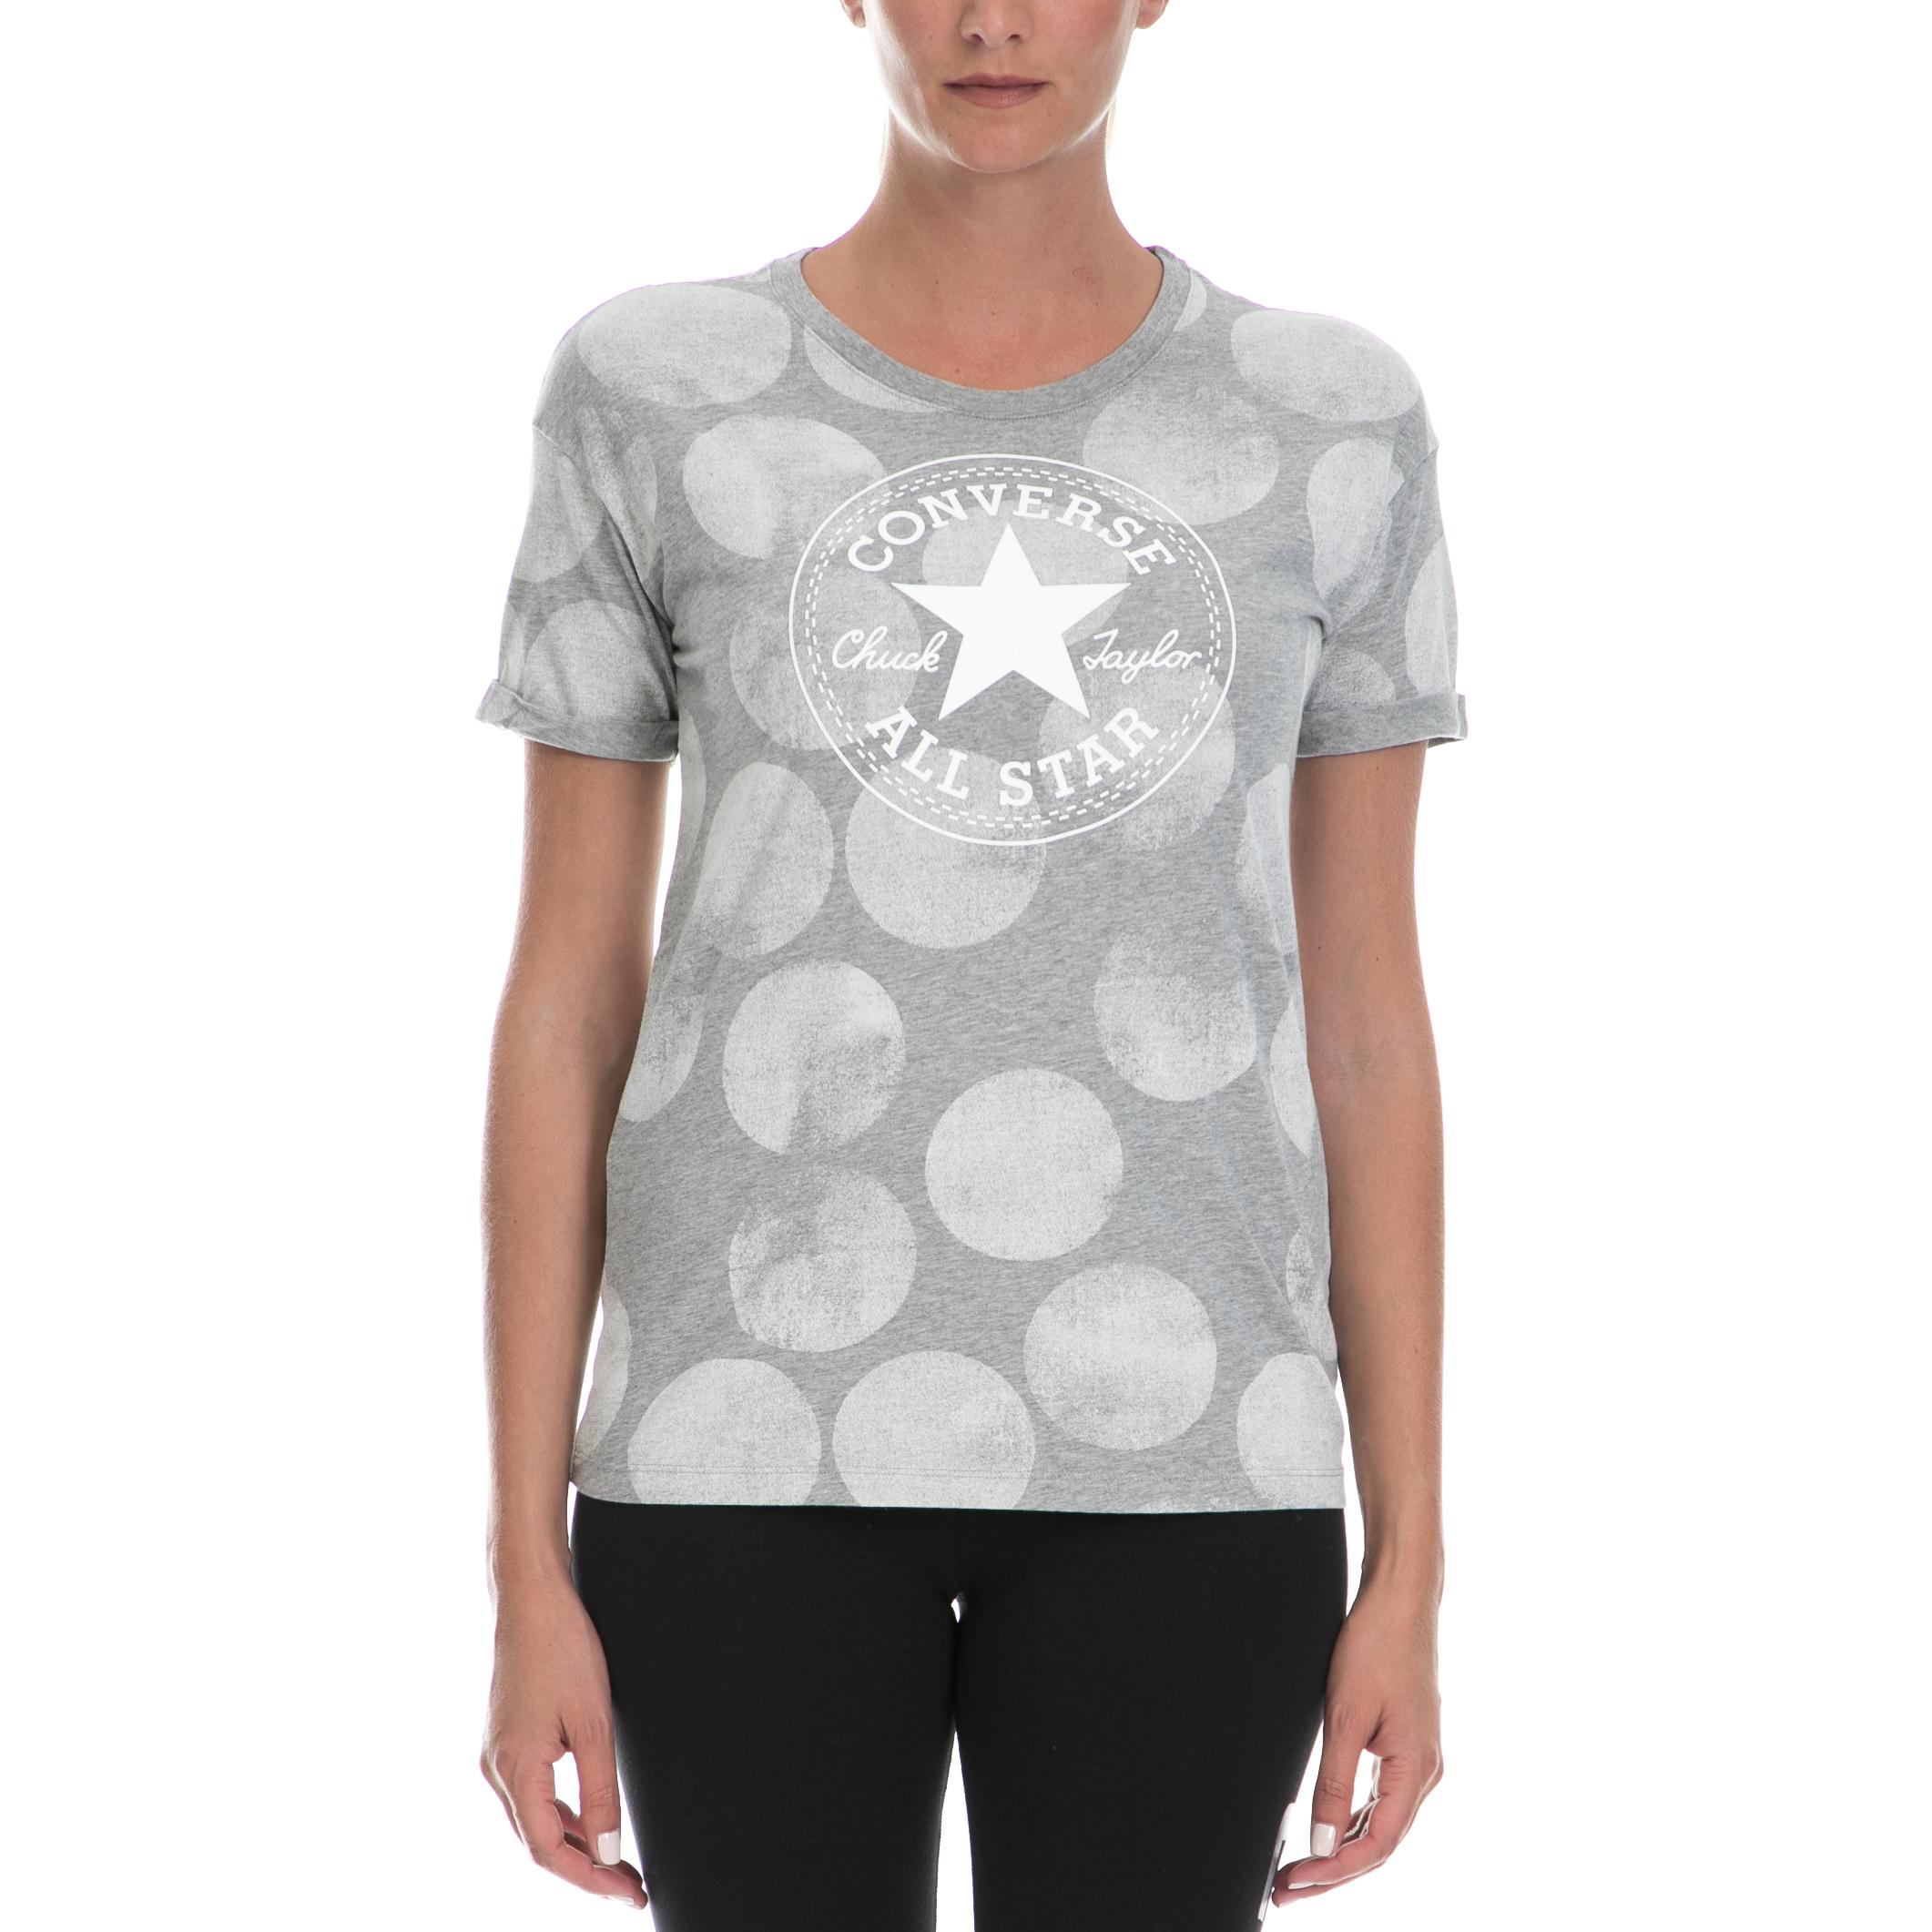 CONVERSE - Γυναικεία μπλούζα CONVERSE γκρι γυναικεία ρούχα αθλητικά t shirt τοπ